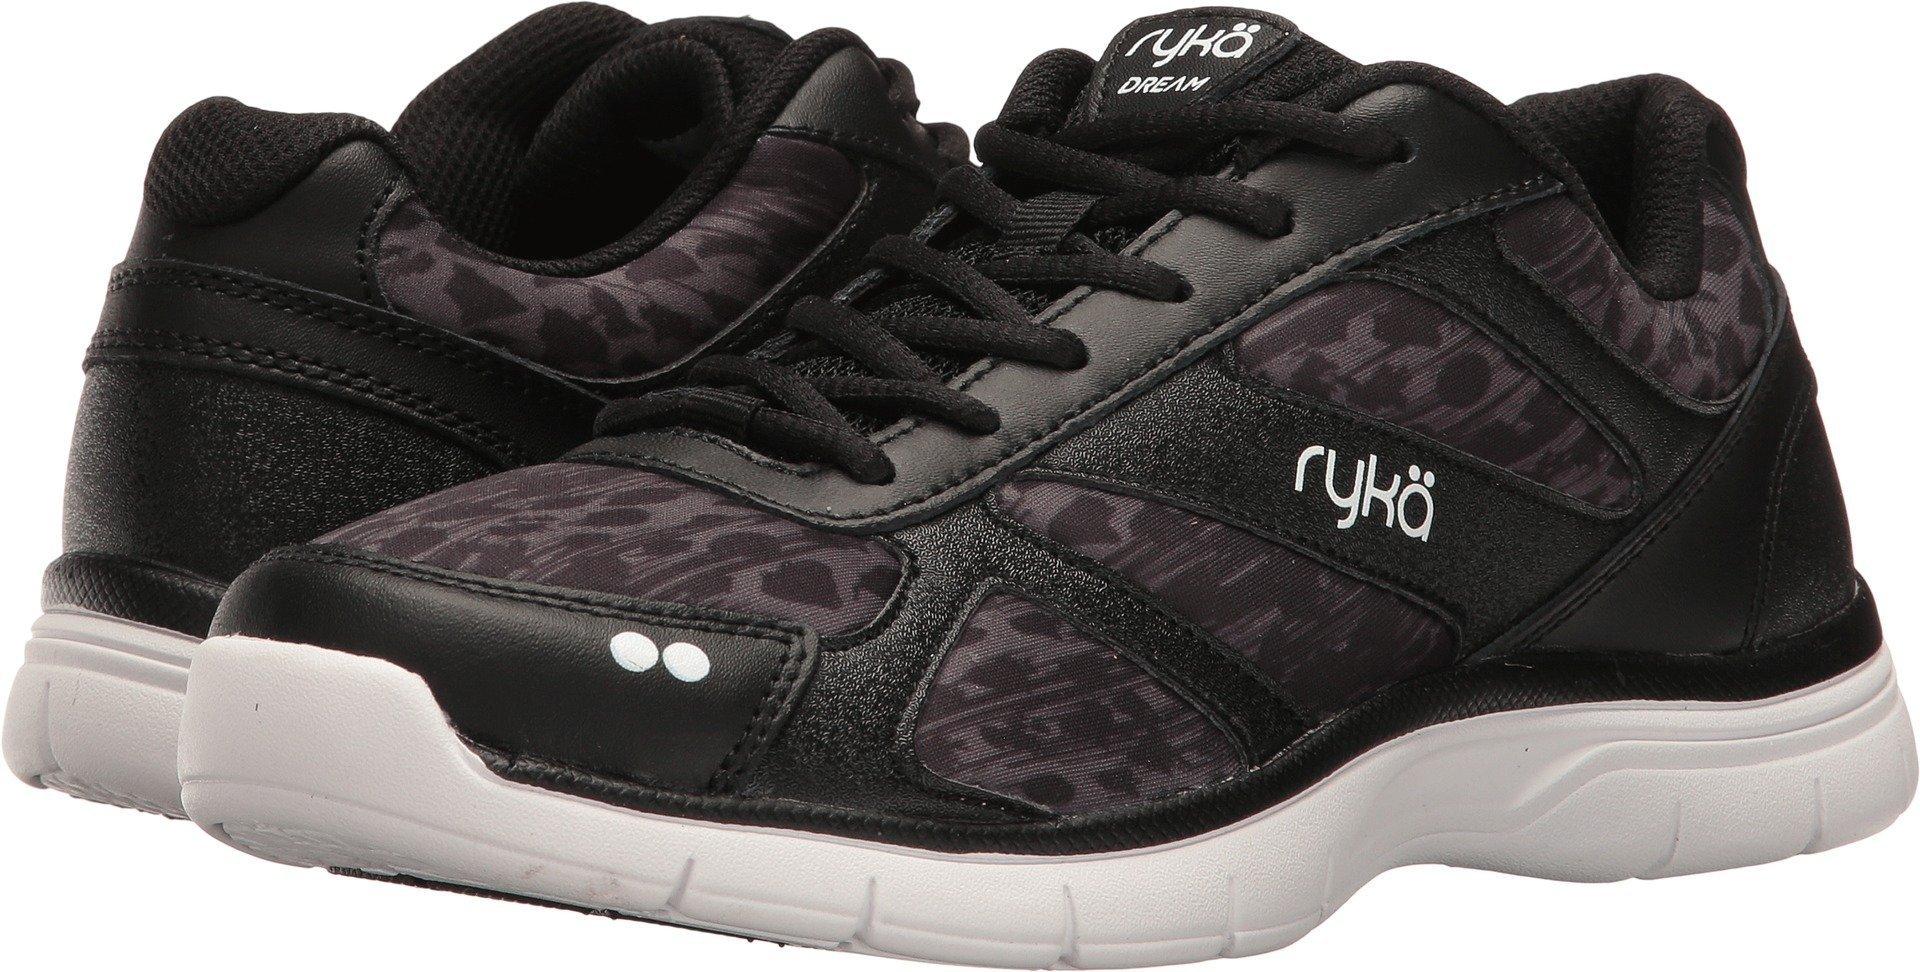 Ryka Women's Dream SMT Black/Iron Grey/White 7 B US